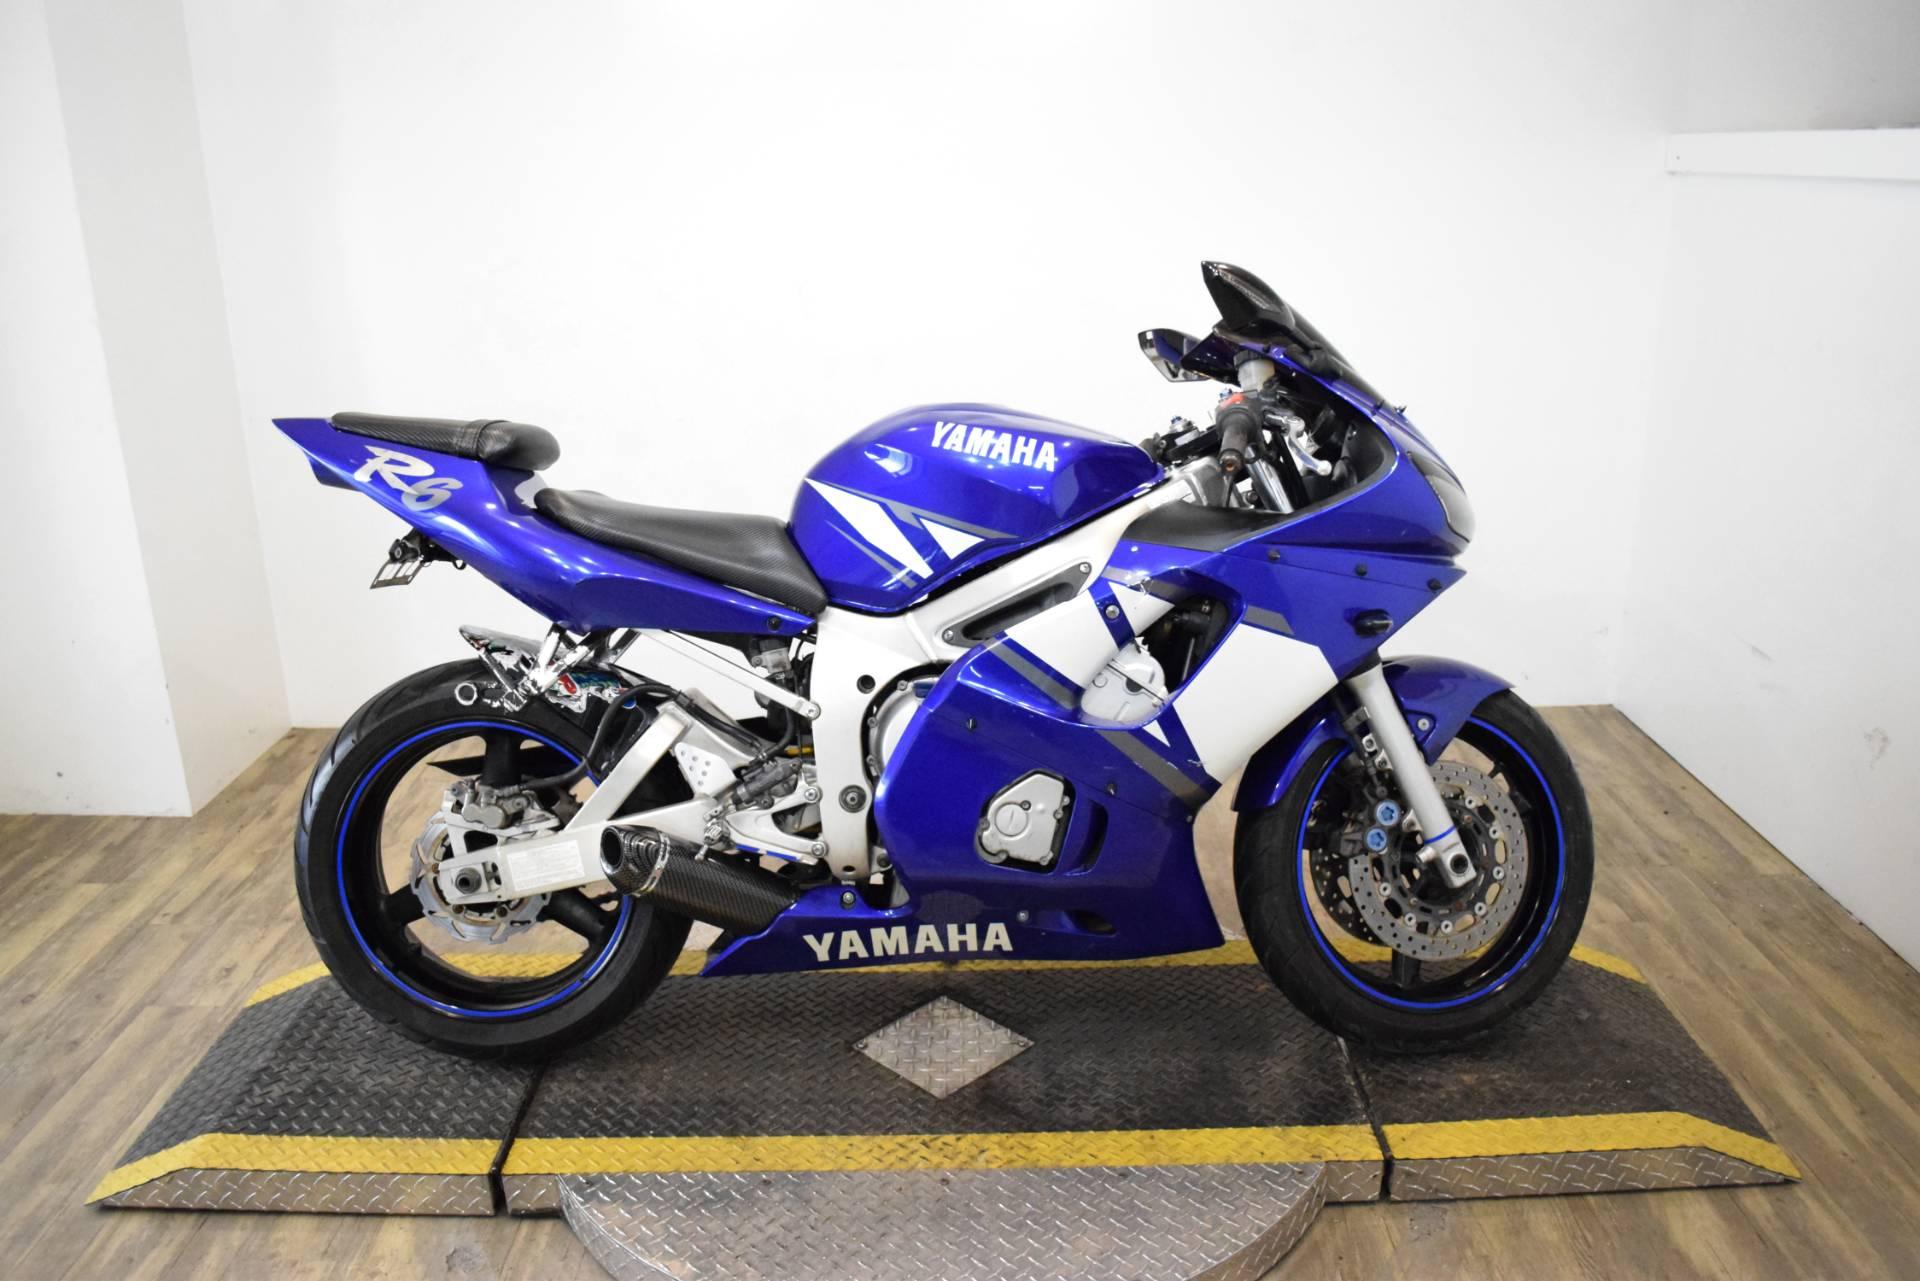 2001 Yamaha YZF-R6 for sale 292523